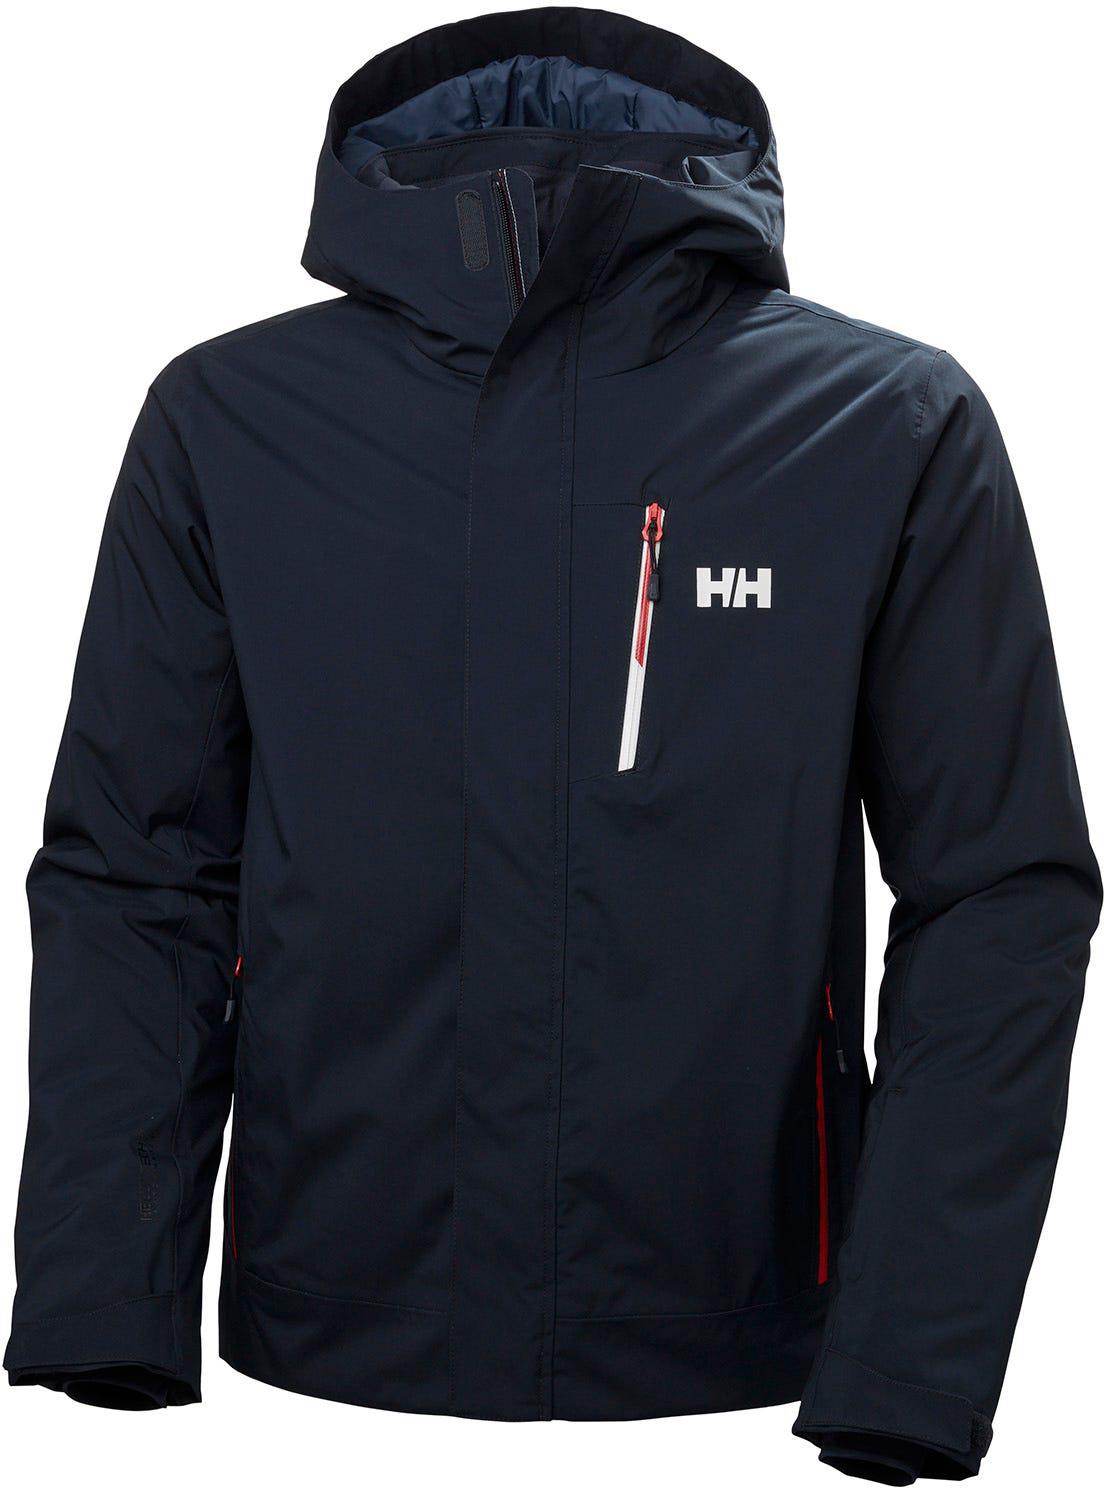 Helly Hansen Mens Lifaloft Hooded Insulator Waterproof Jacket 28/% OFF RRP